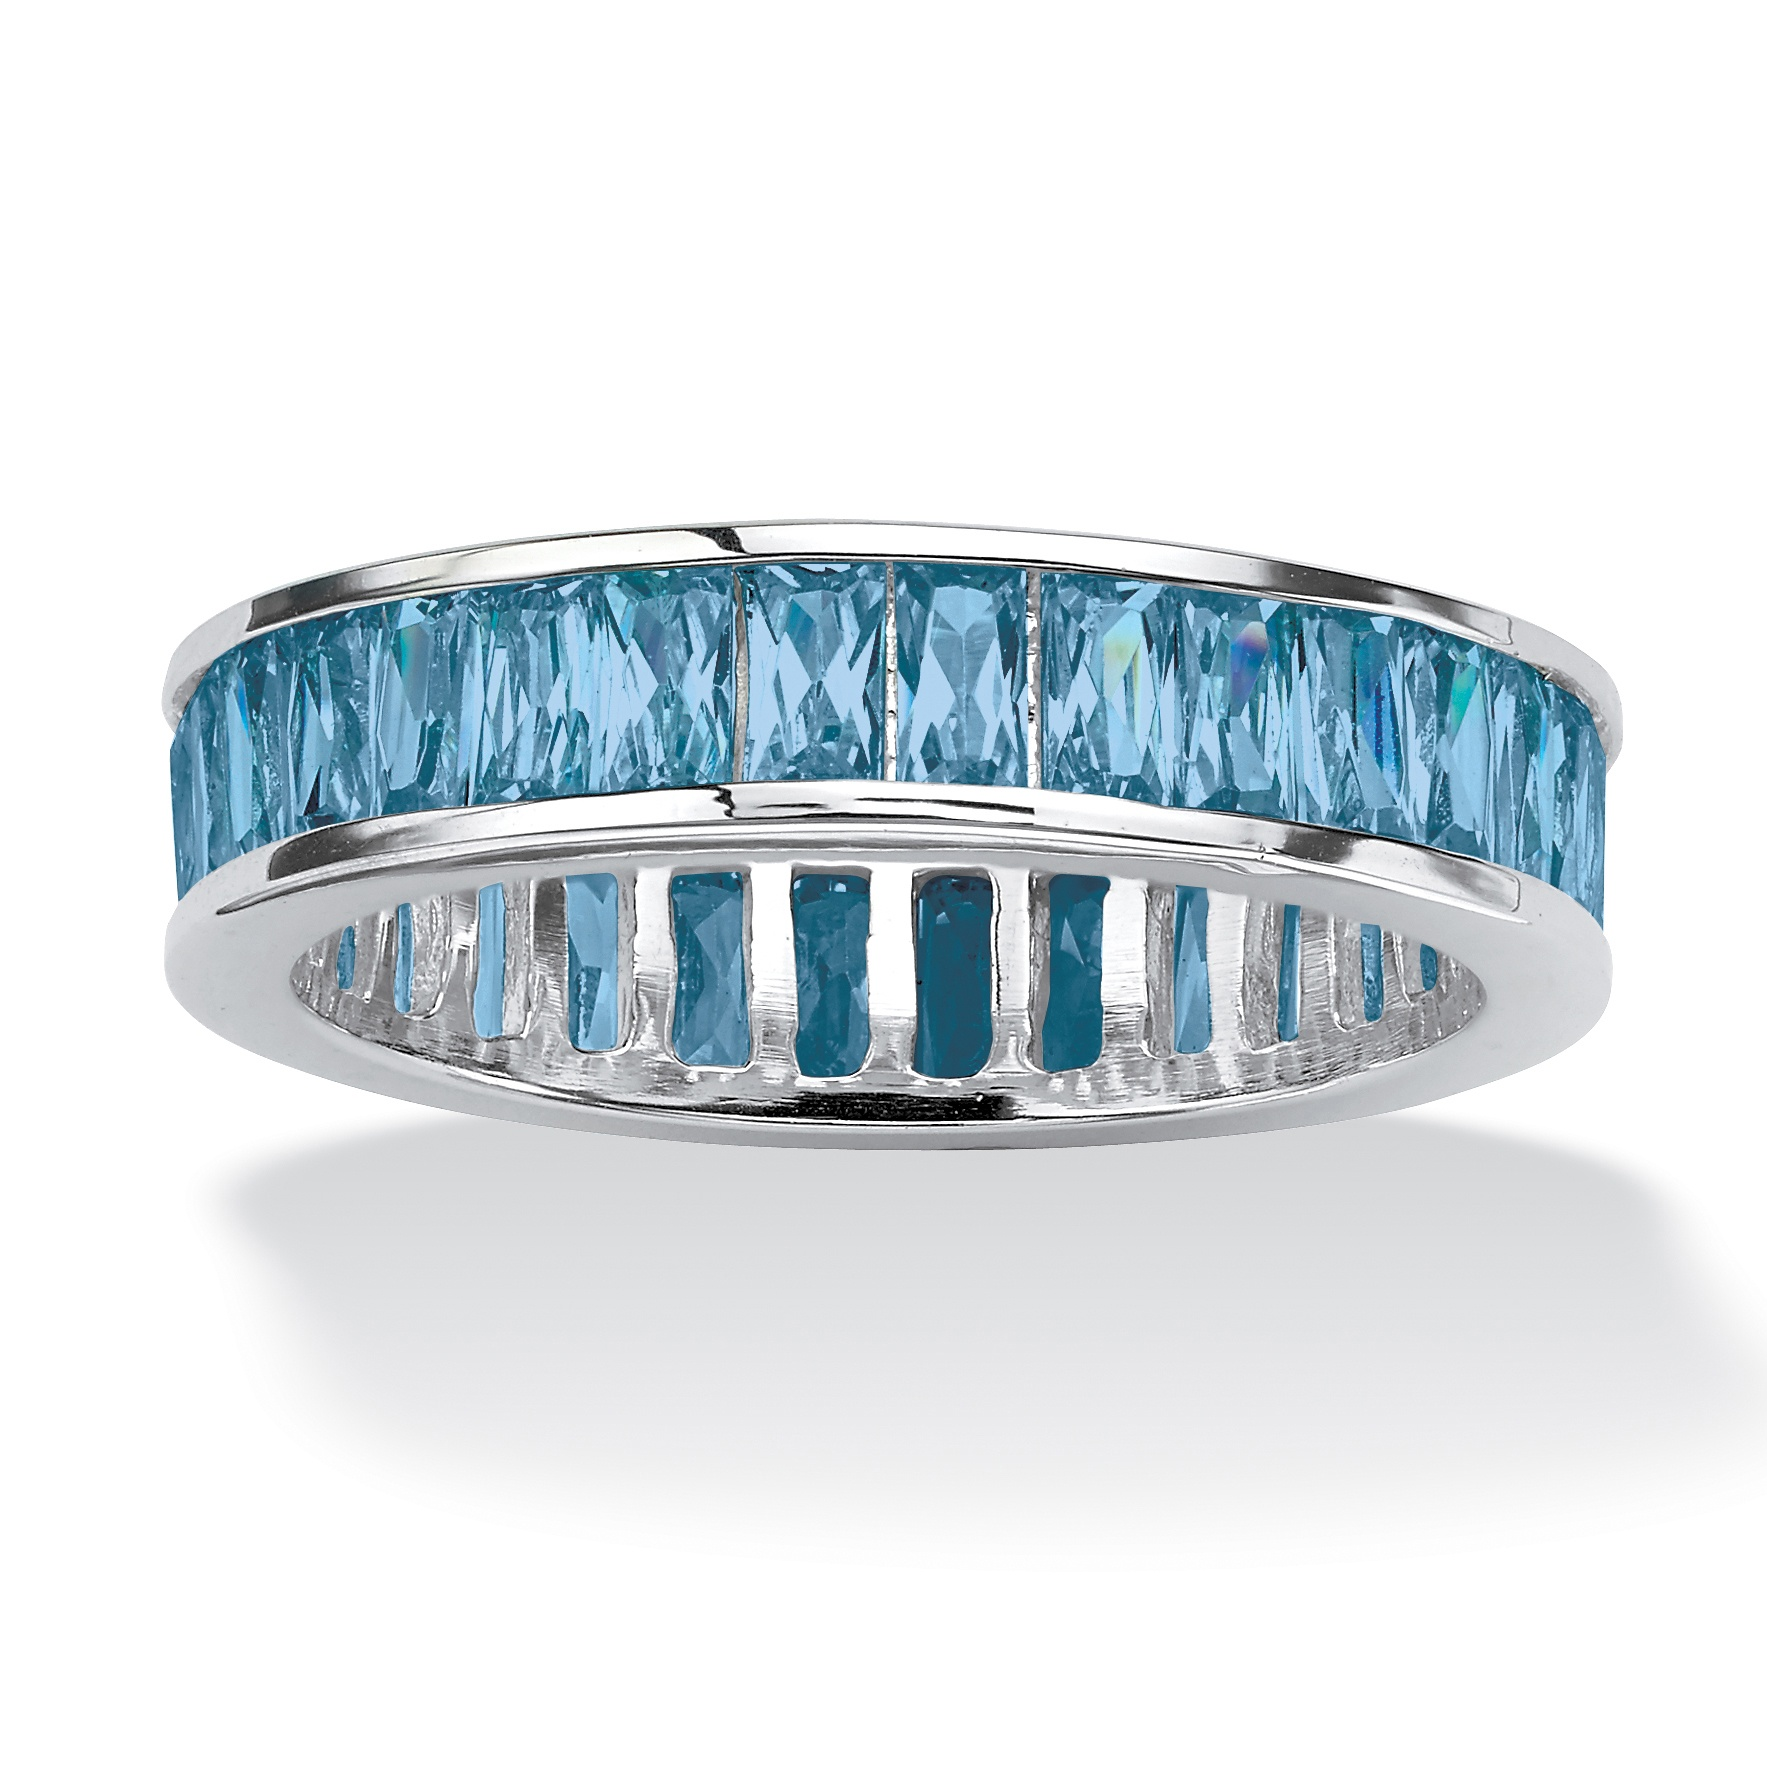 PalmBeach Jewelry Emerald-Cut Birthstone Sterling Silver Eternity Band- March at Sears.com